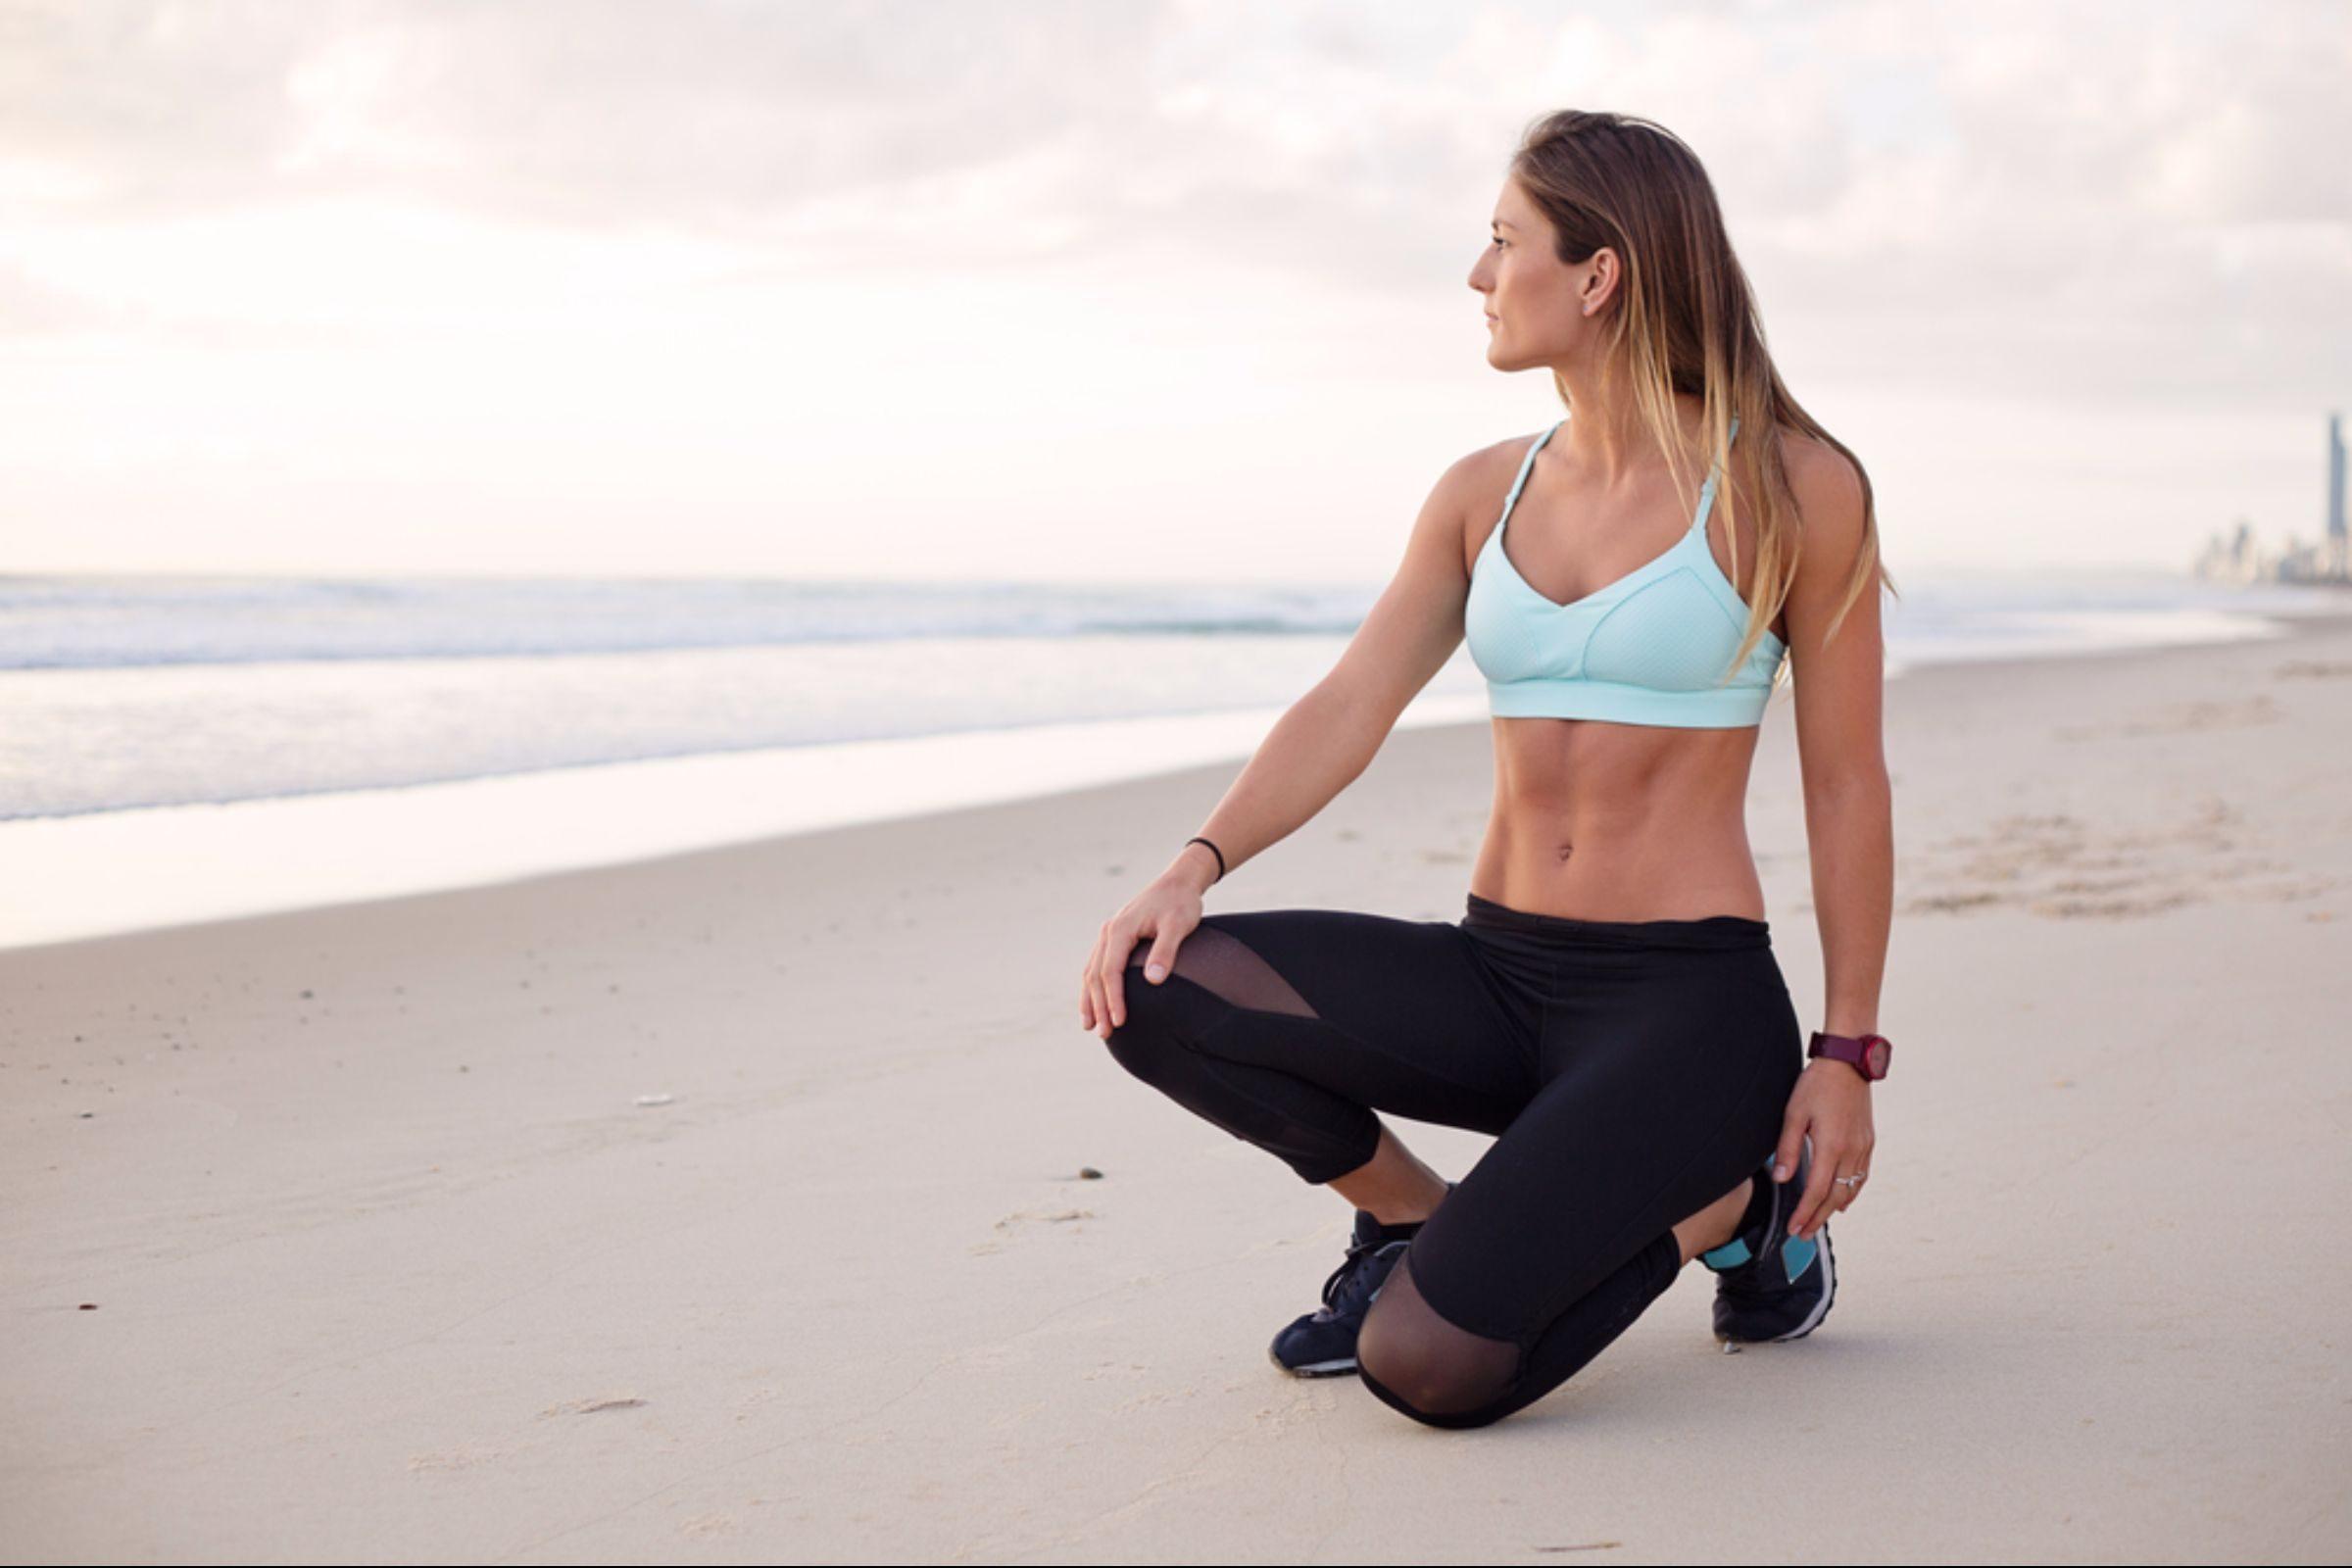 Female athlete posing on beachfront